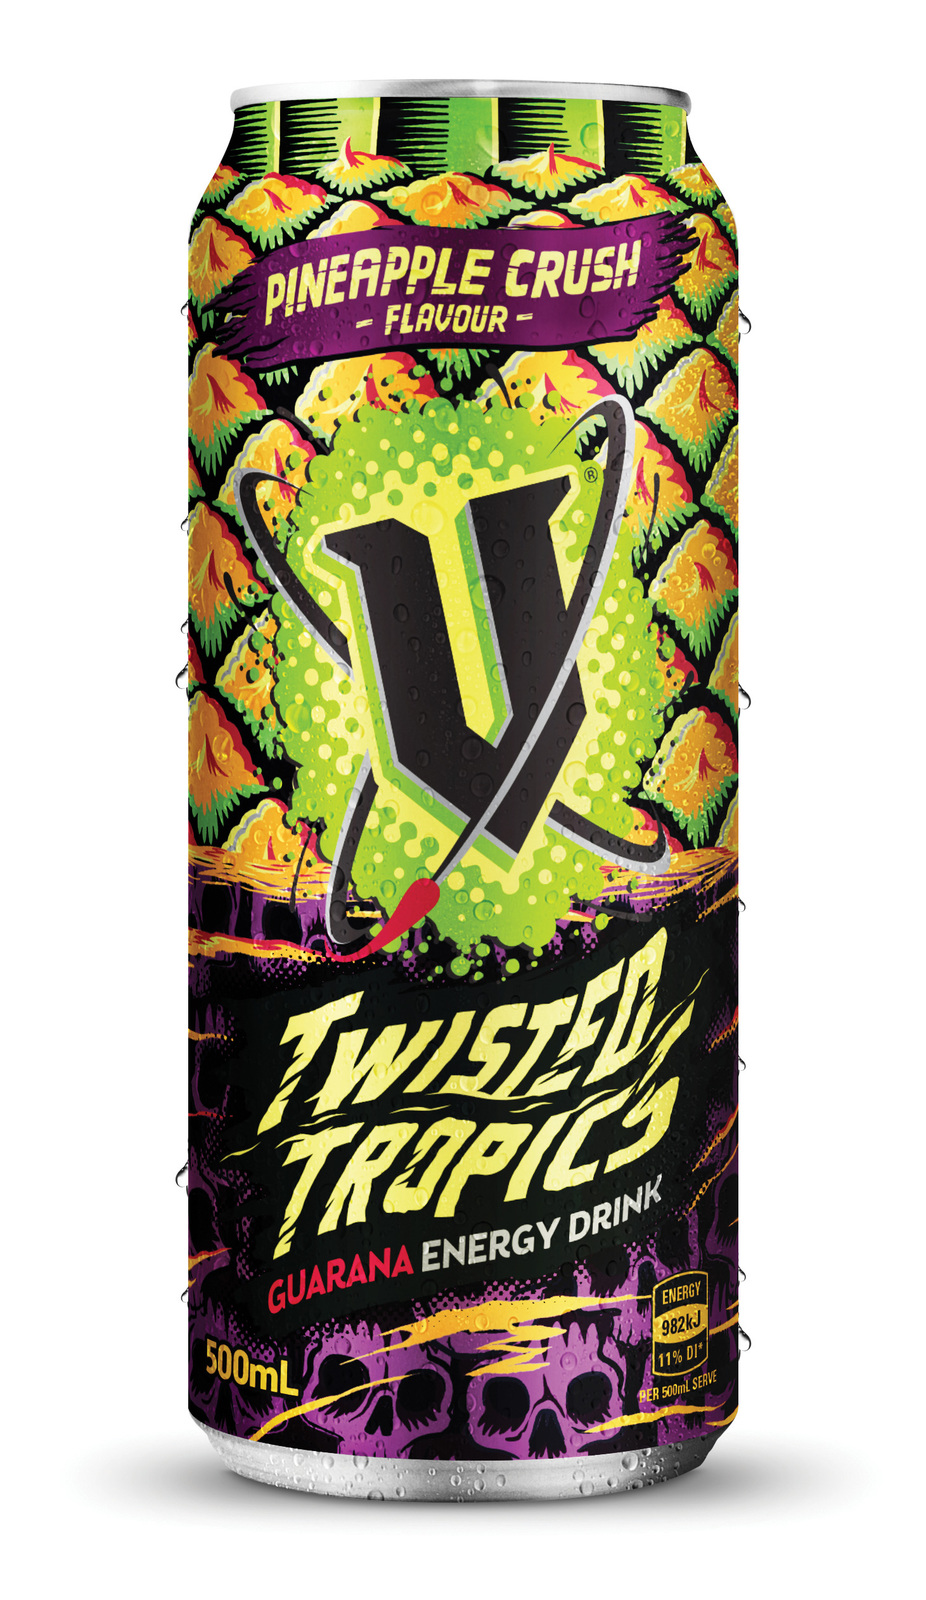 V Twisted Tropics 500ml (12 pack) image